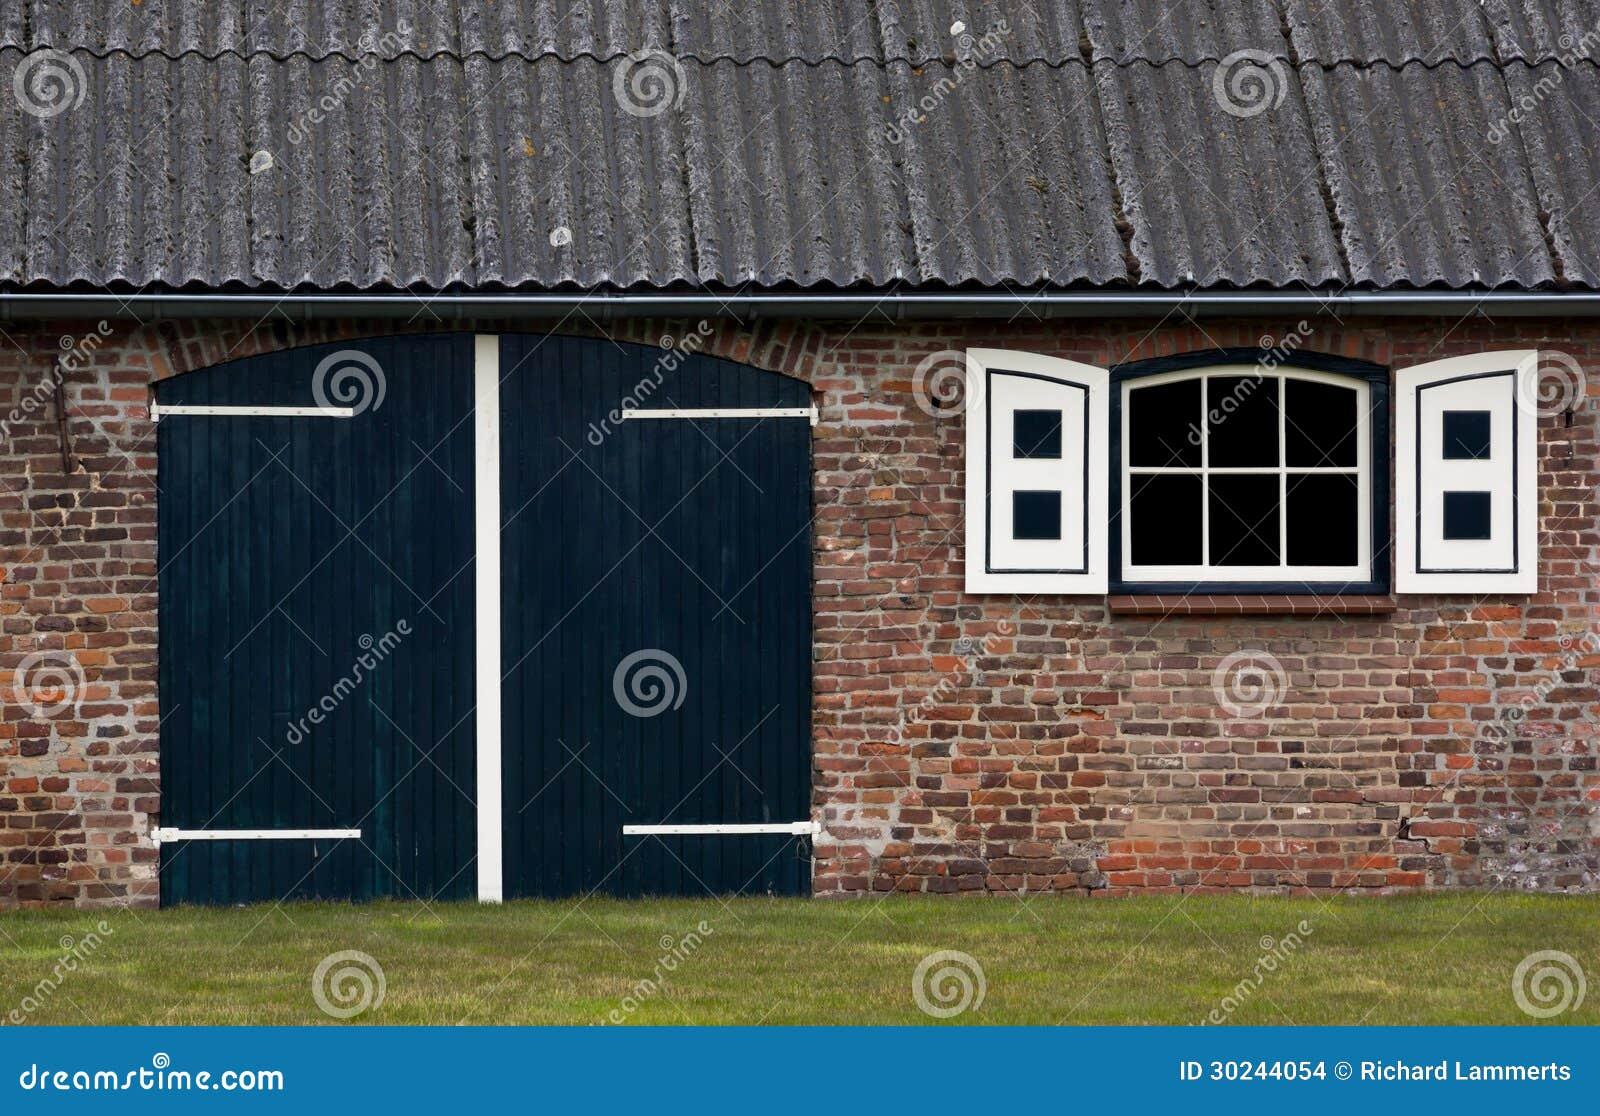 Dutch farmhouse stock images image 30244054 for Farm house netherlands